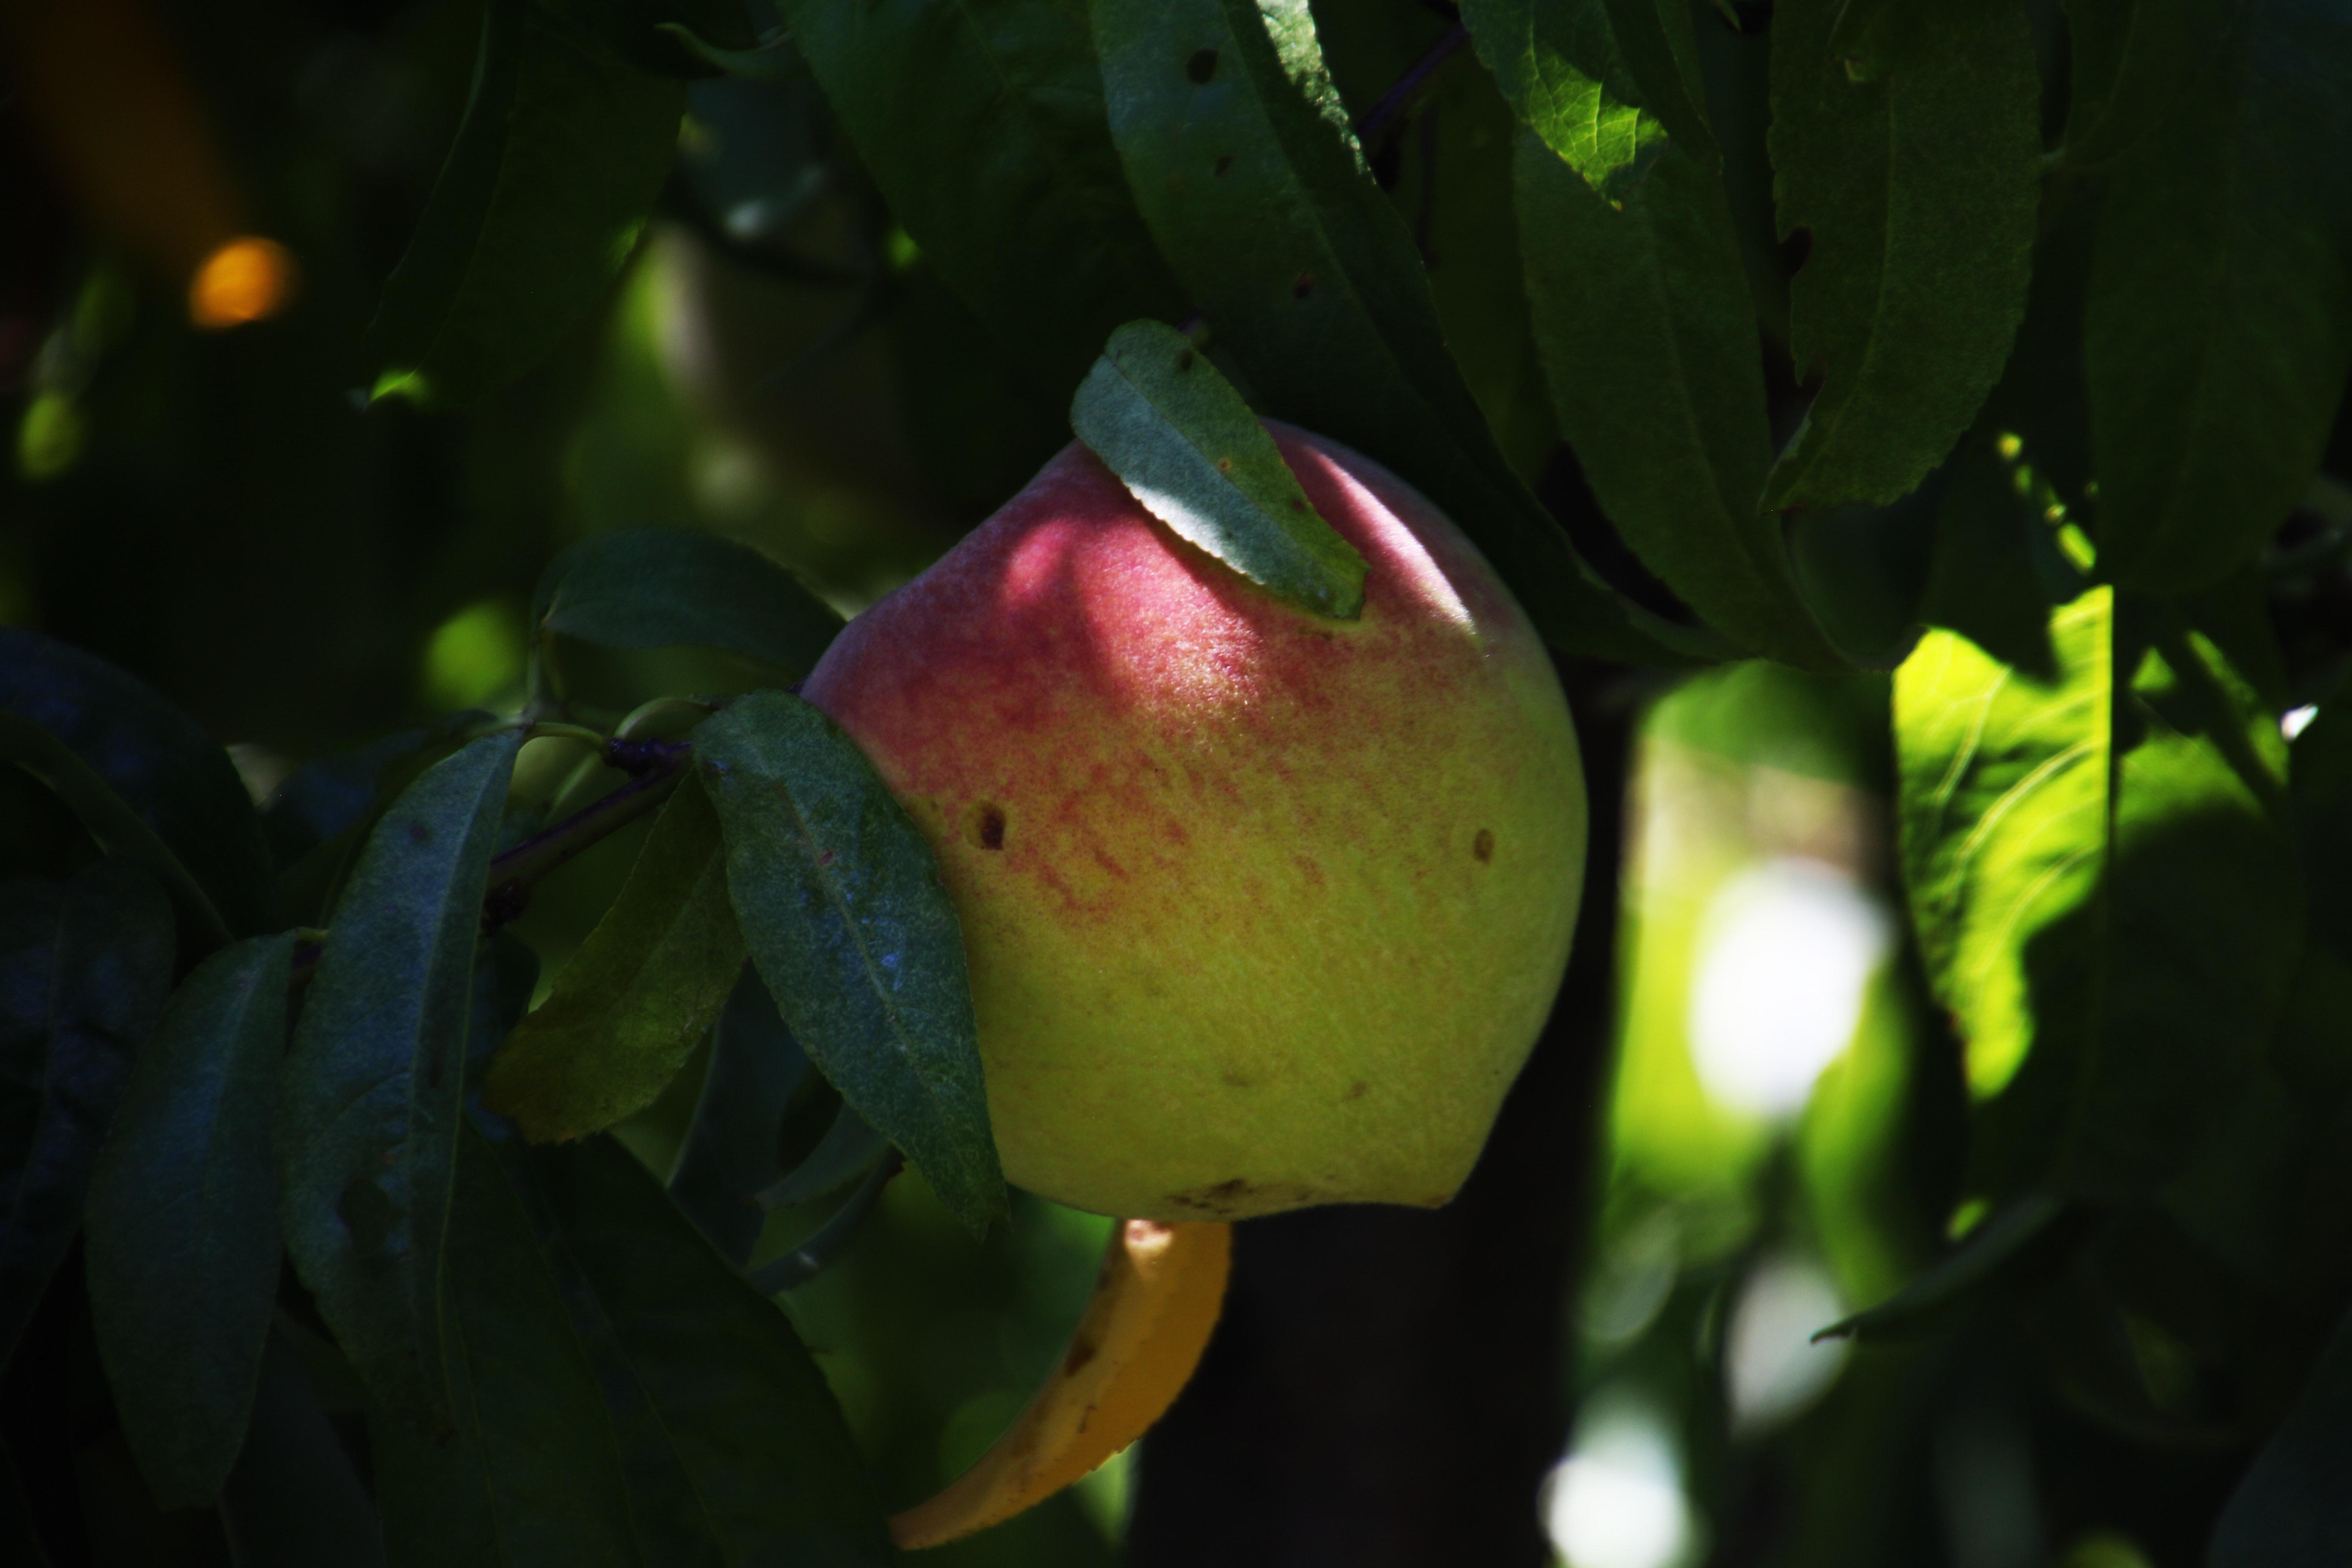 Fruit ripening on a tree photo